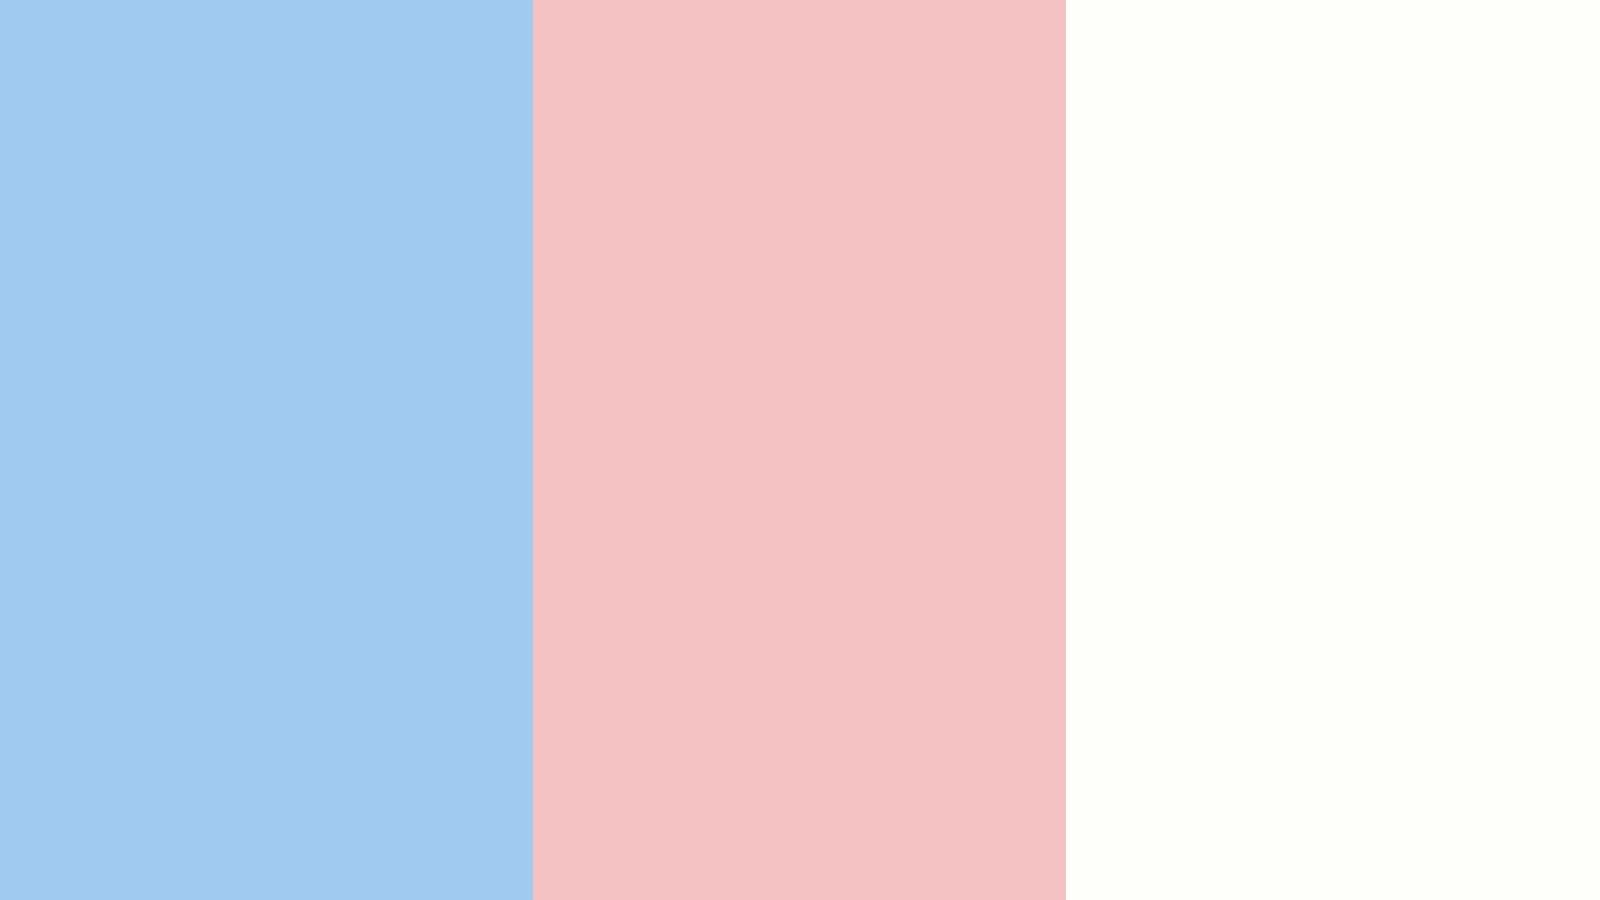 Blue And Pink Wallpapers Wallpapersafari